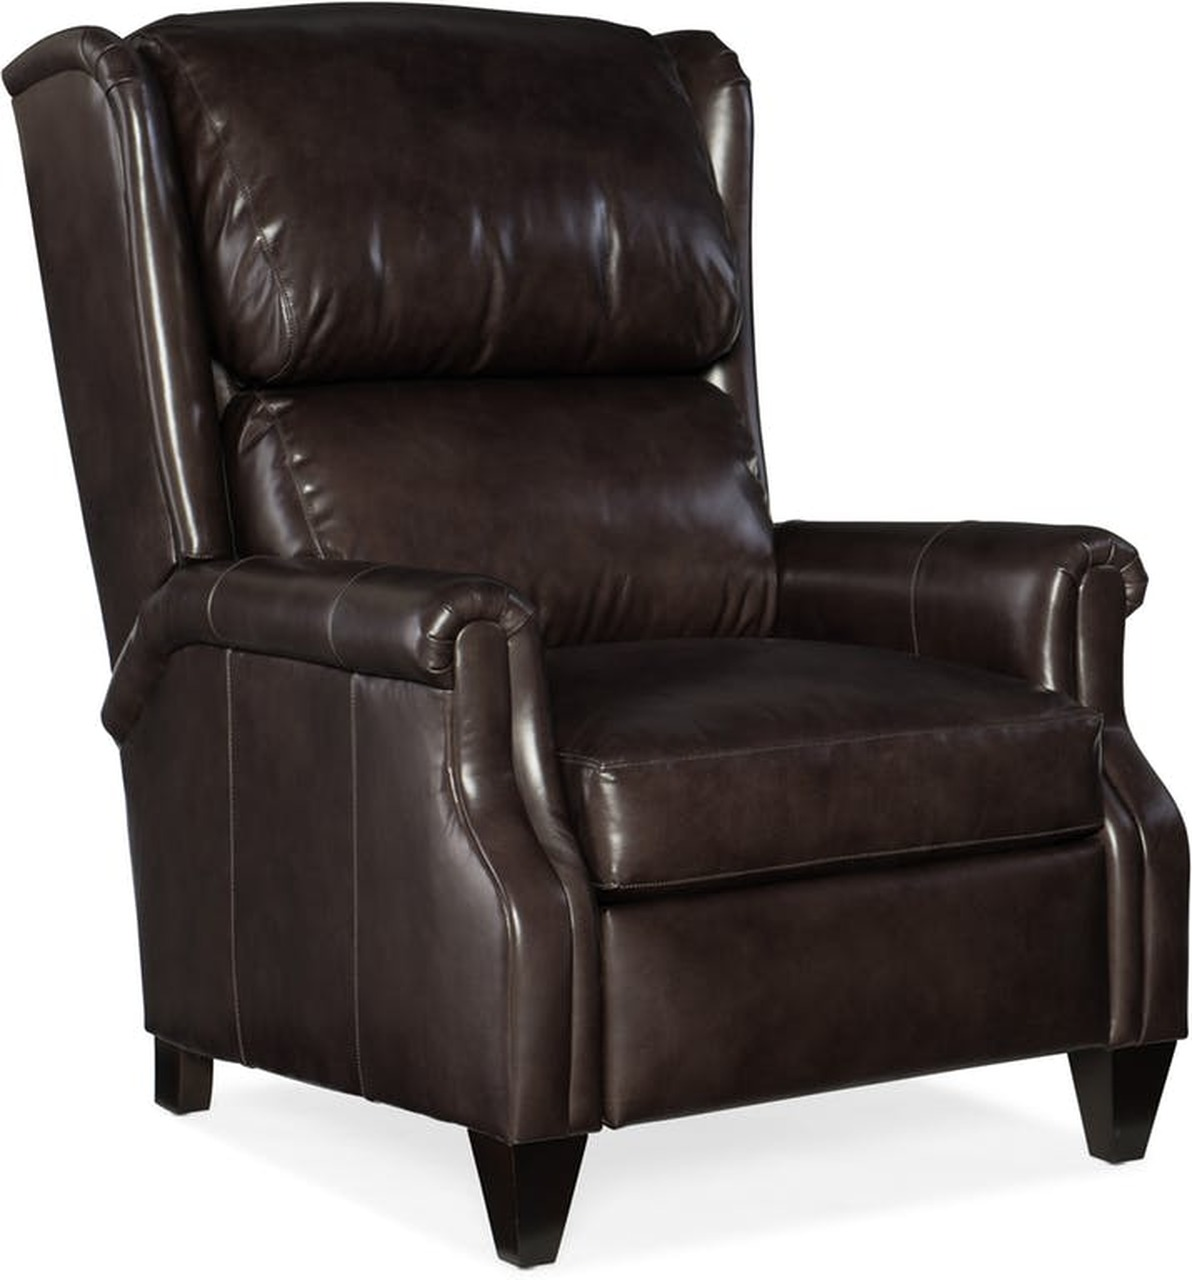 Remarkable Bradington Young Walsh 4043 Recliner Lamtechconsult Wood Chair Design Ideas Lamtechconsultcom